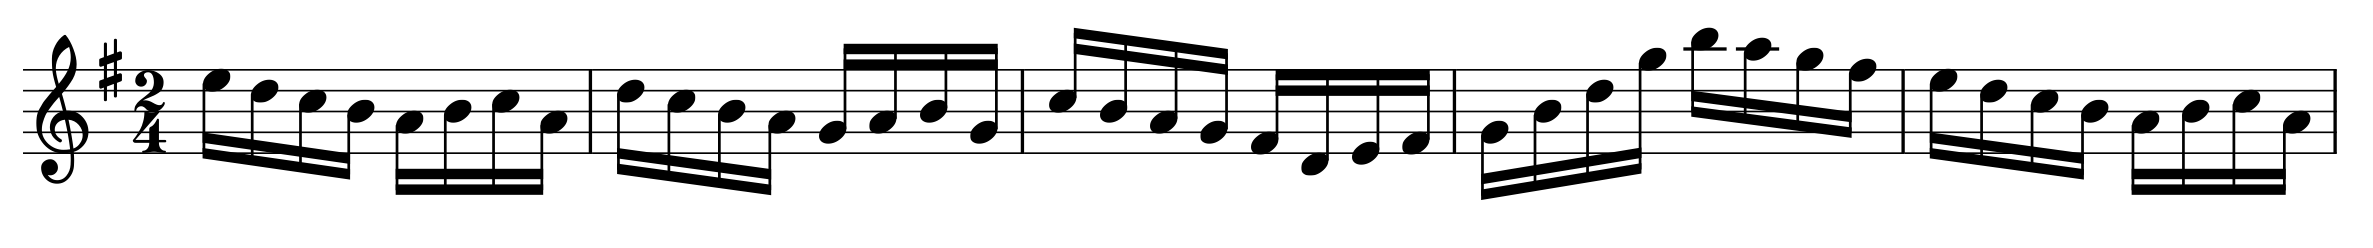 extrait_soixante_exercices_franz_wohlfahrt